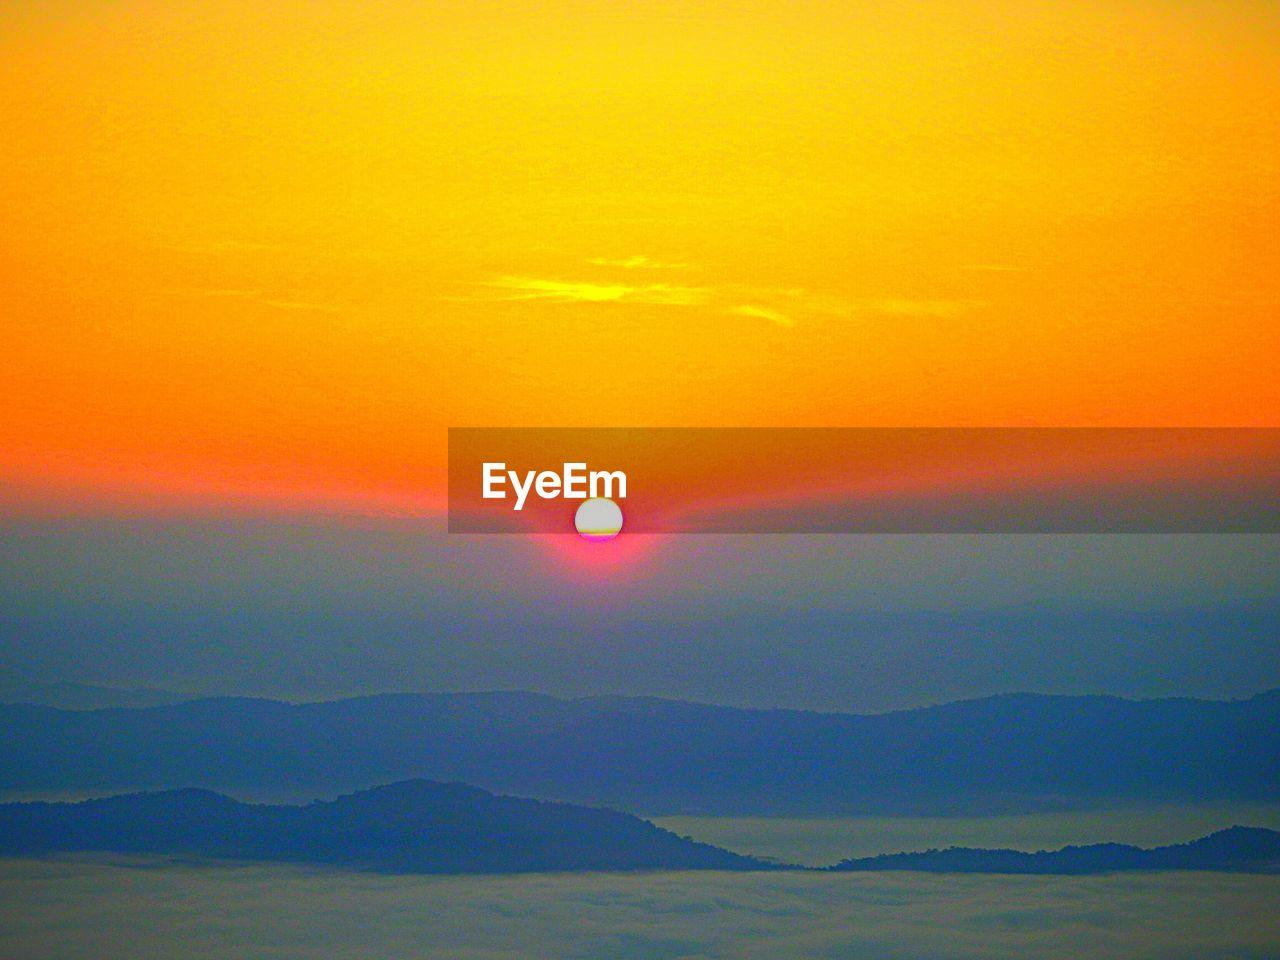 sky, beauty in nature, scenics - nature, sunset, sun, tranquil scene, tranquility, idyllic, environment, orange color, nature, cloud - sky, no people, dramatic sky, sunlight, mountain range, mountain, outdoors, sea, romantic sky